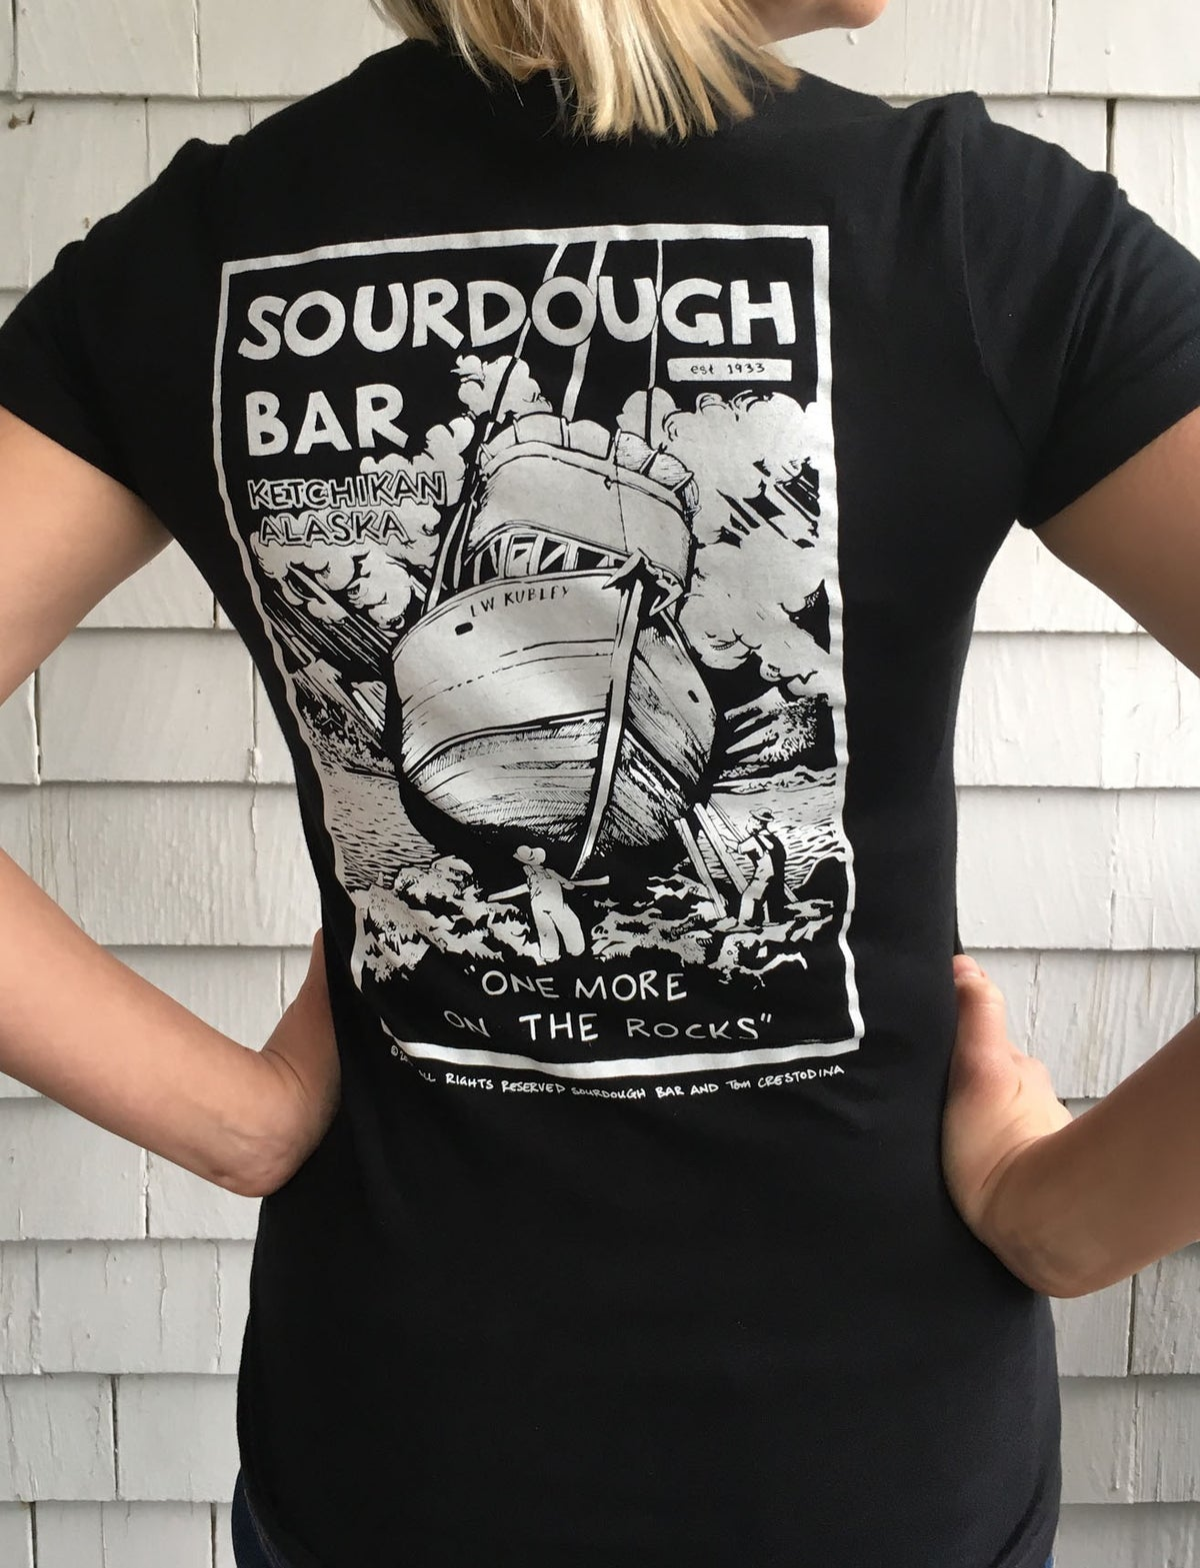 Sourdough tees and hoodies